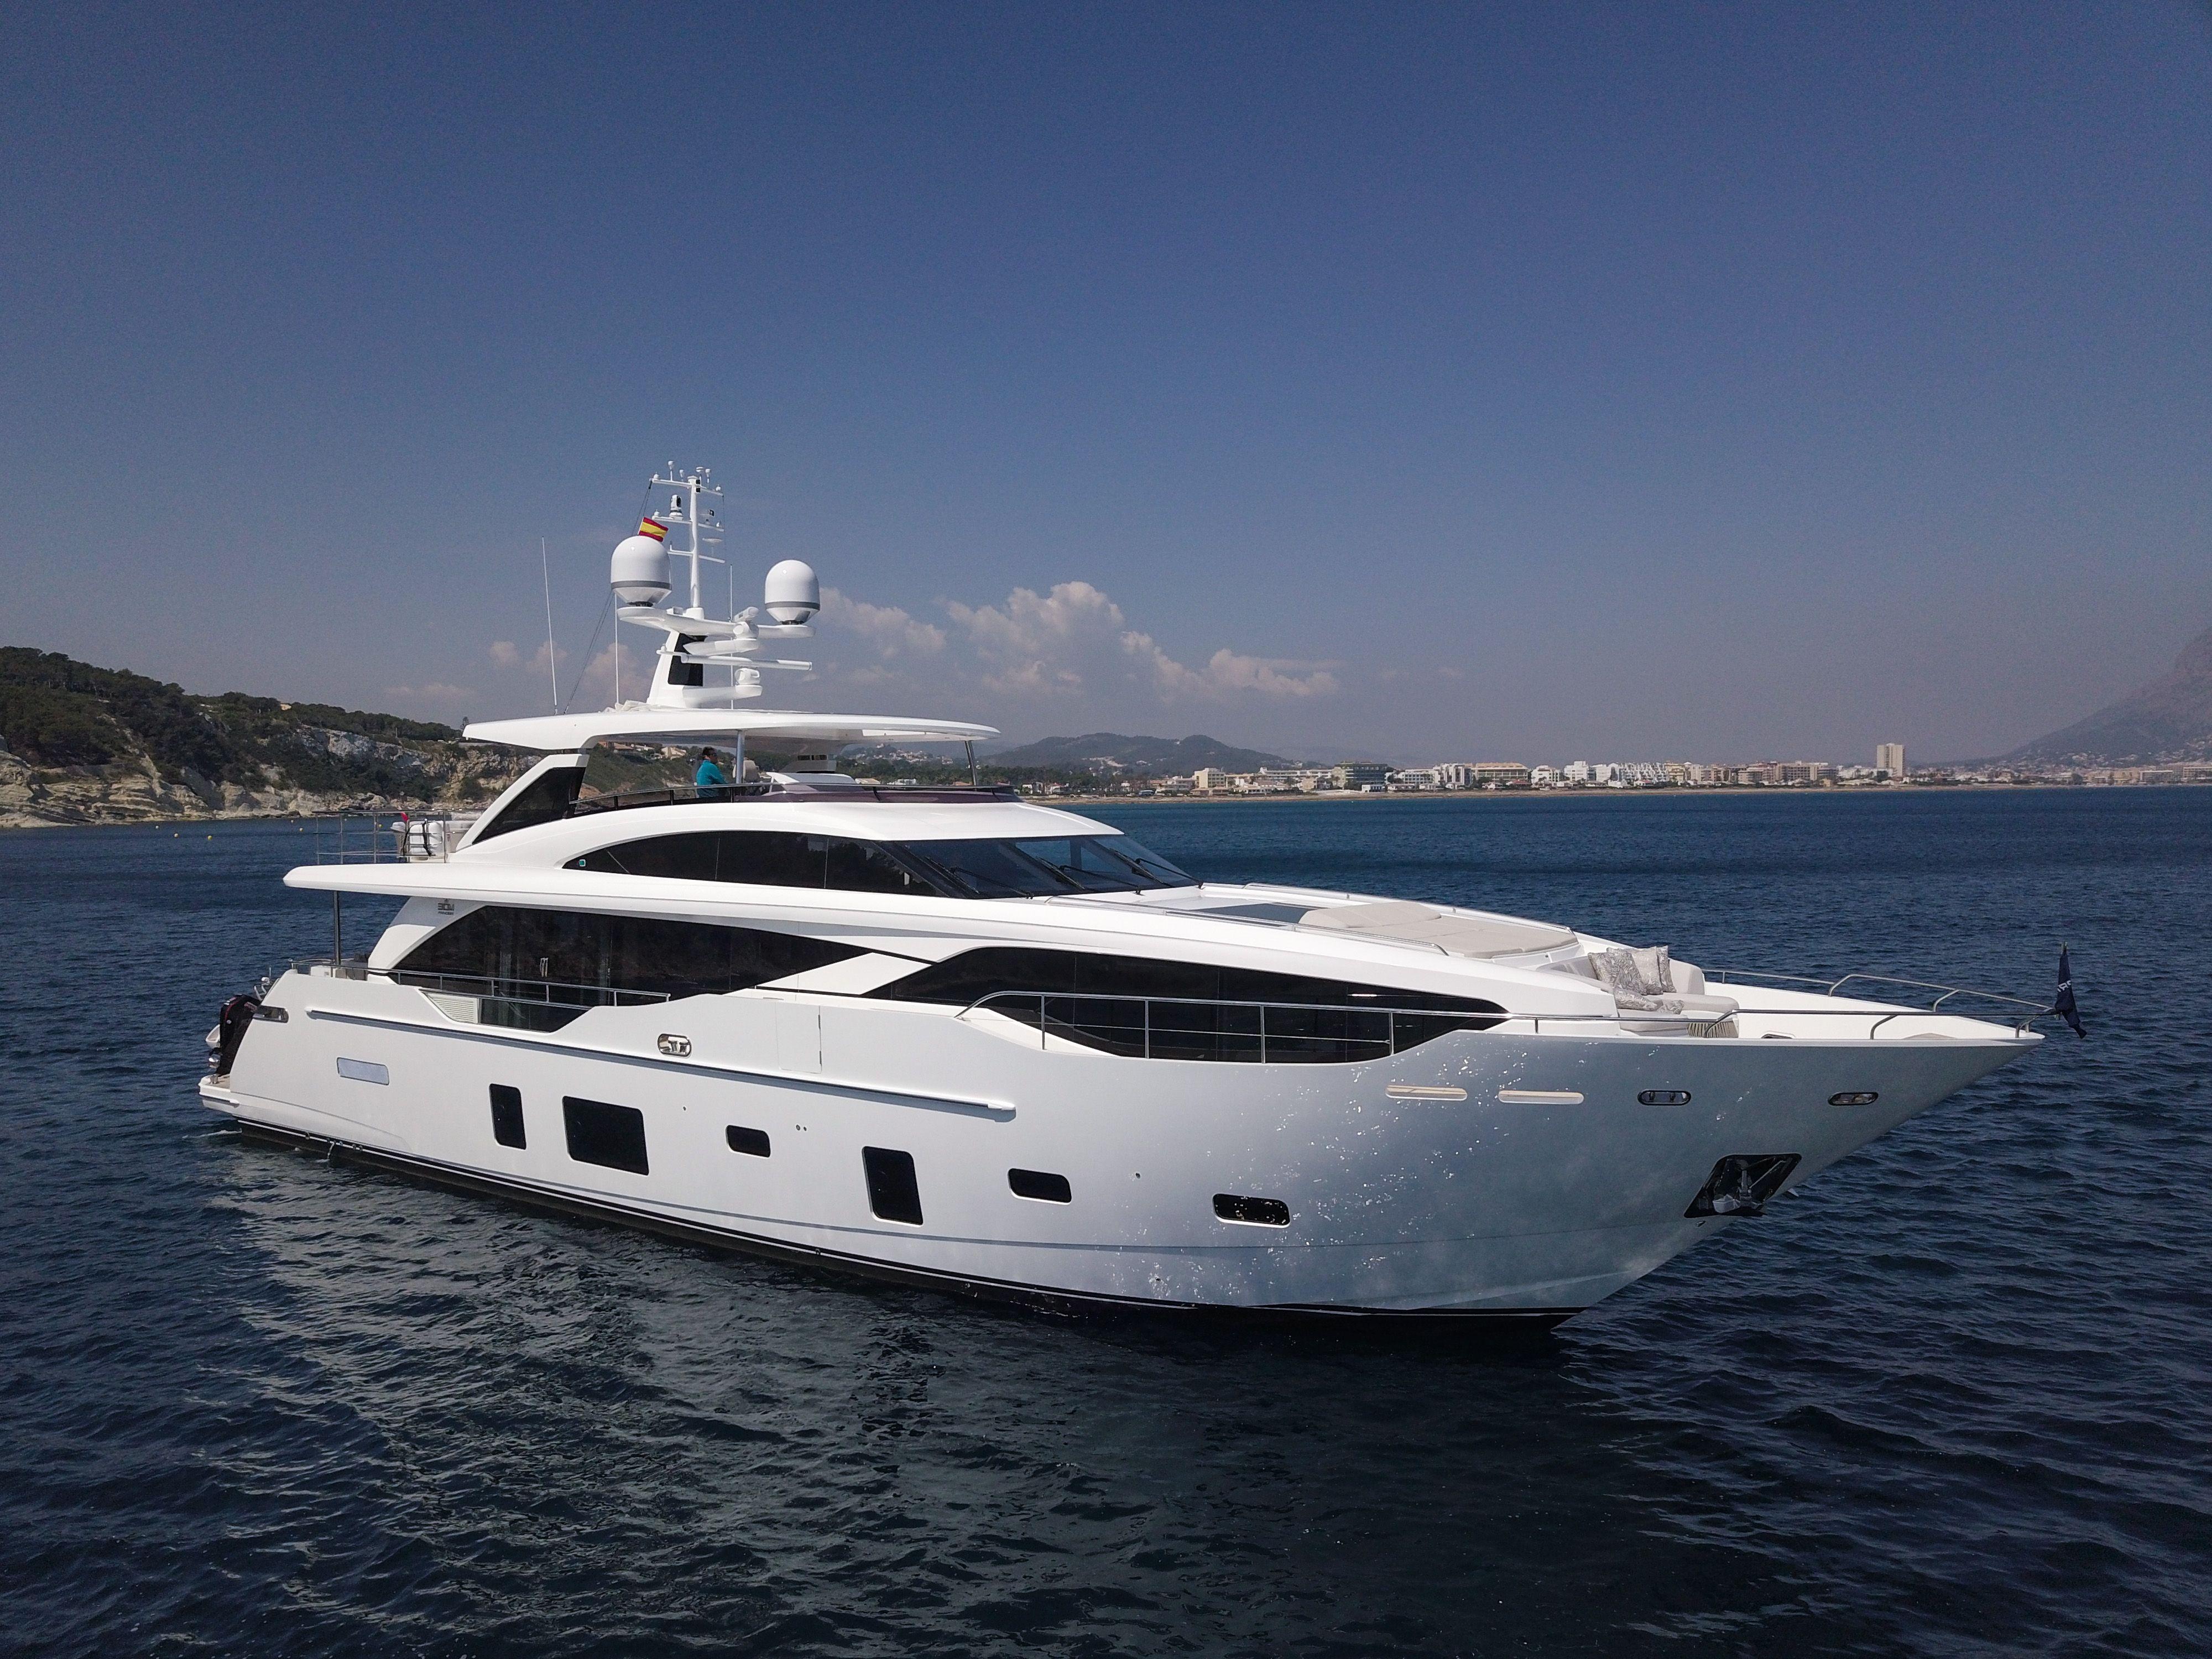 Princess 30m Bandazul Mclass Superyacht Yacht Megayacht